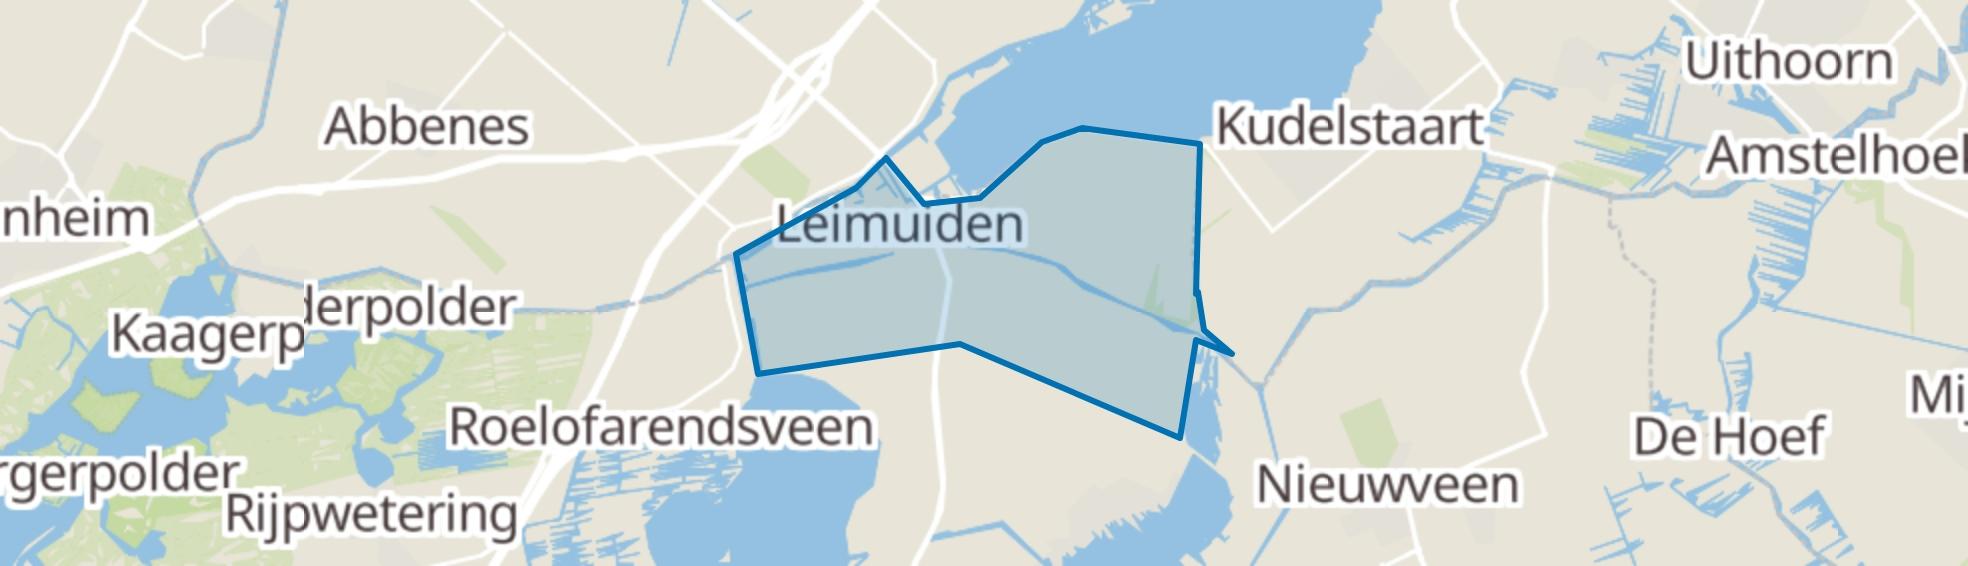 Leimuiden map